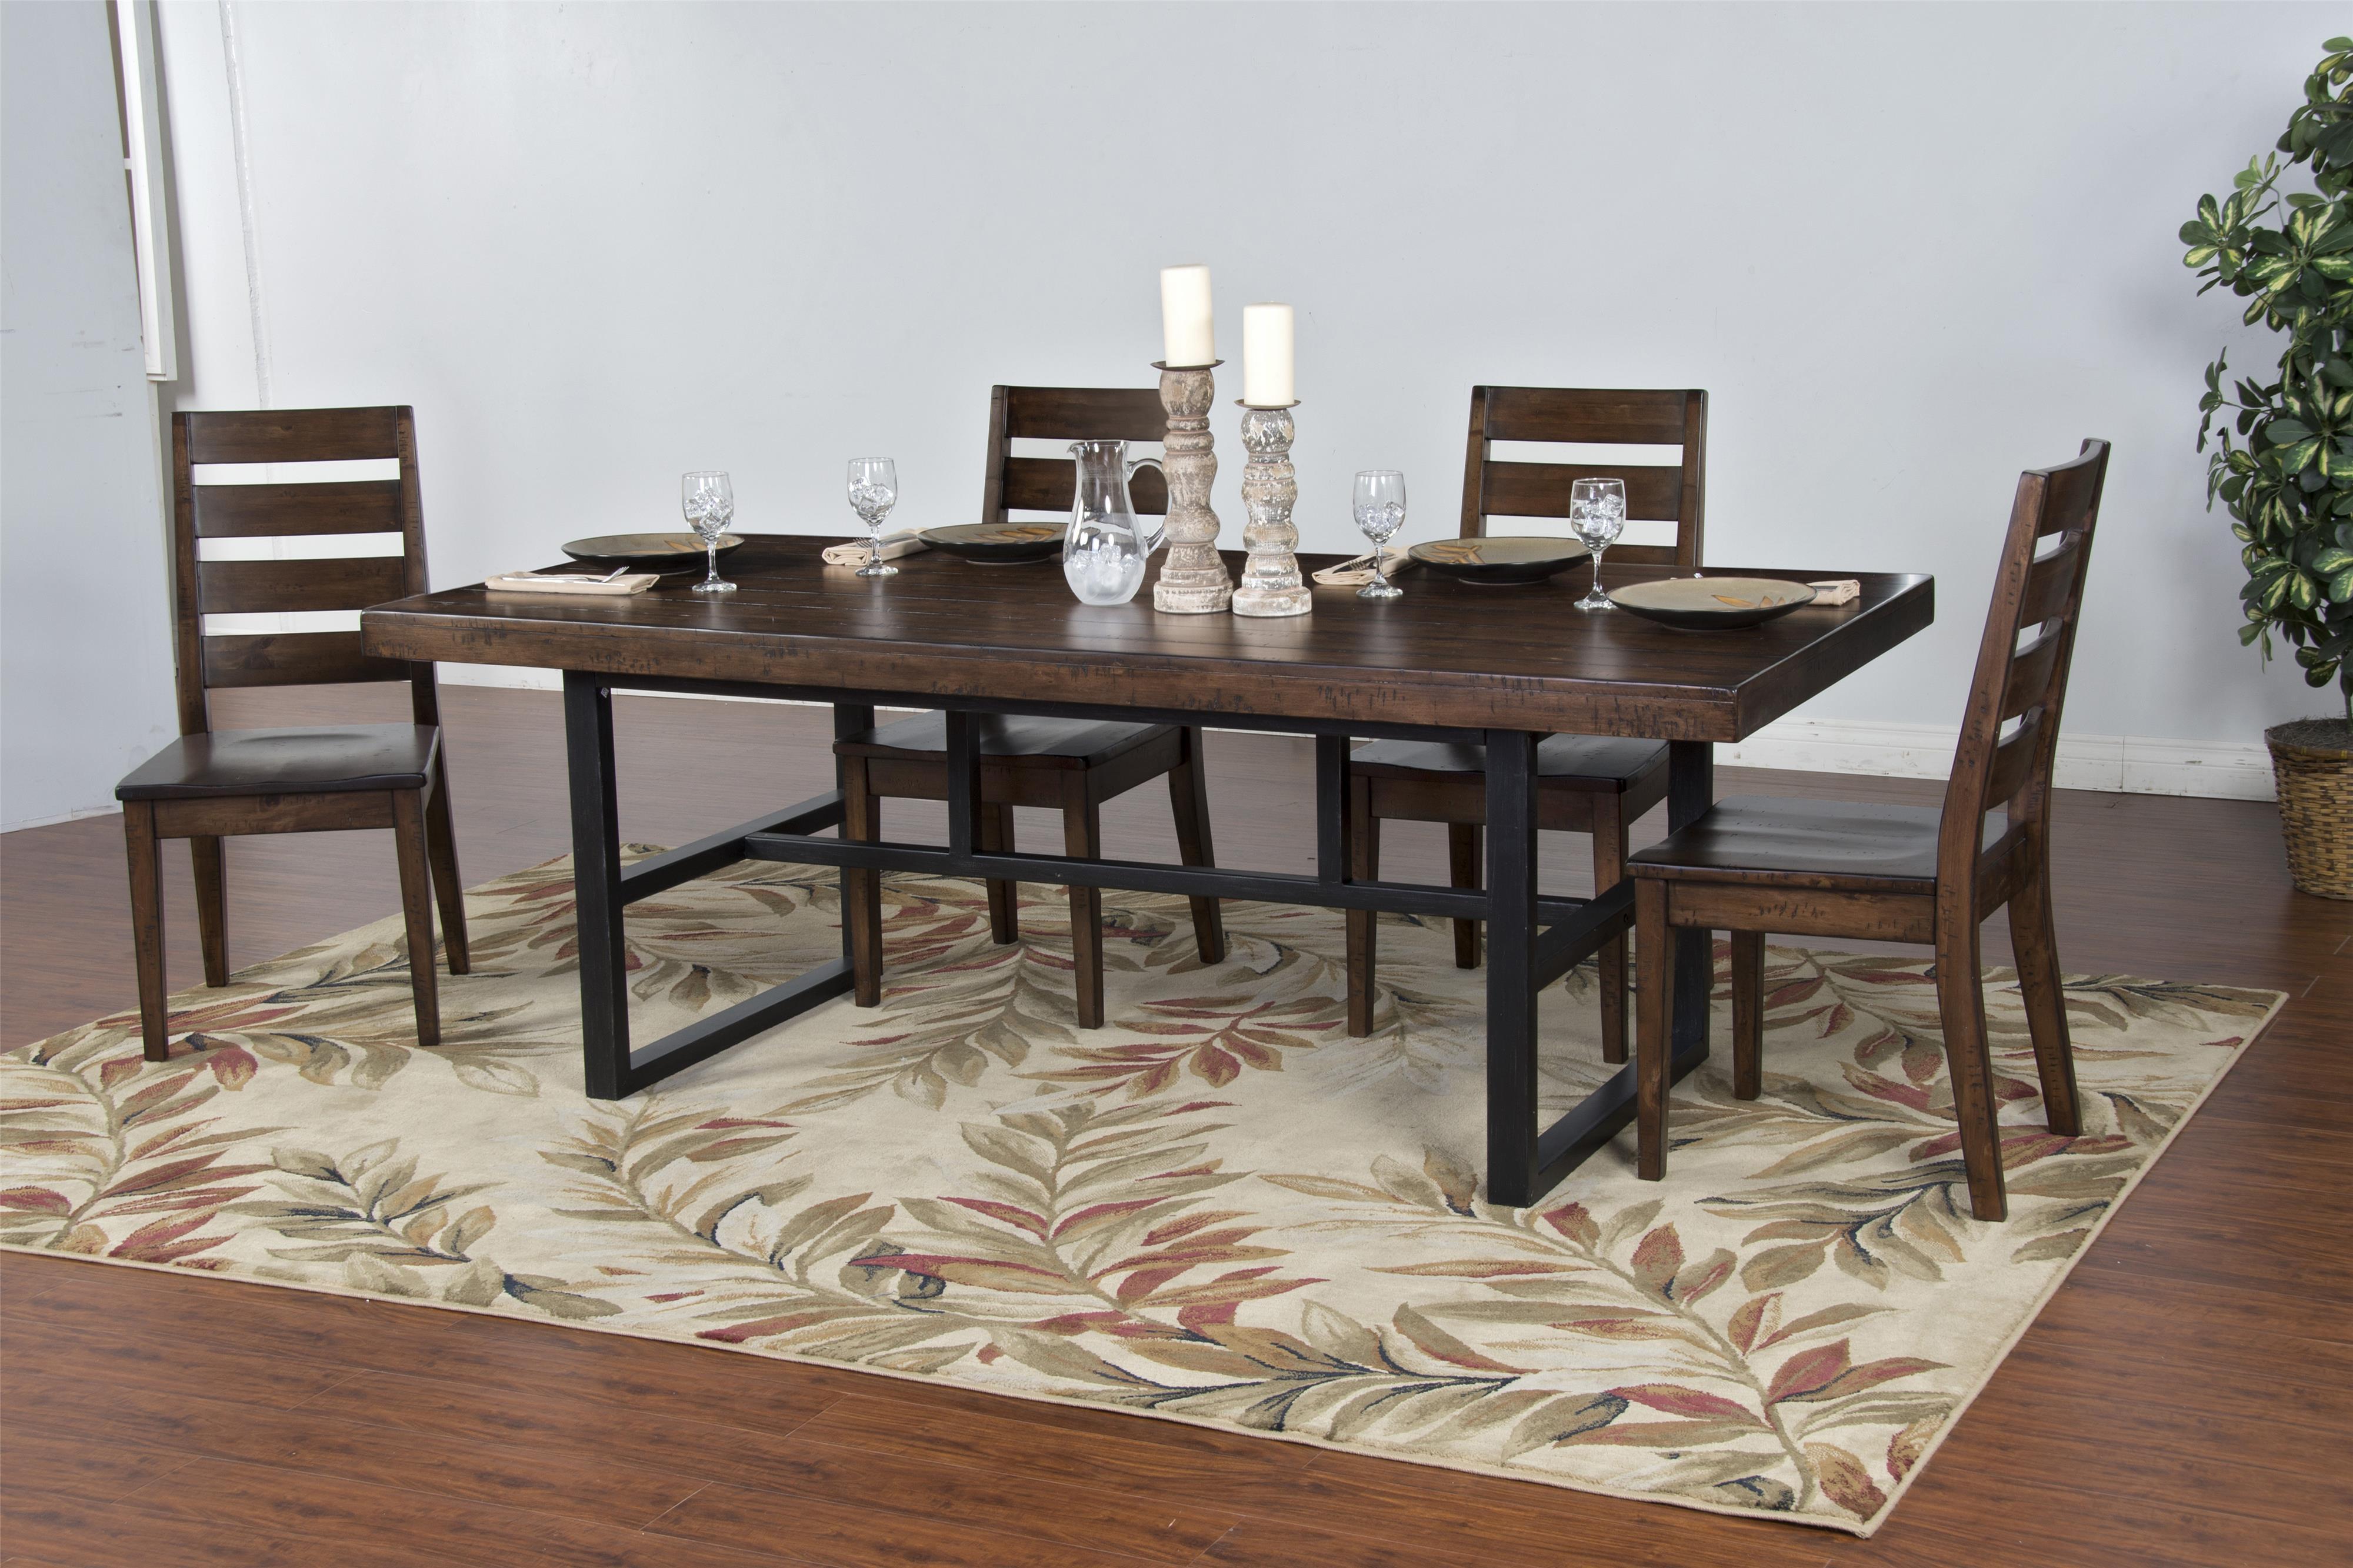 Morris Home Furnishings Wellman Wellman 5-Piece Dining Set - Item Number: 388833292